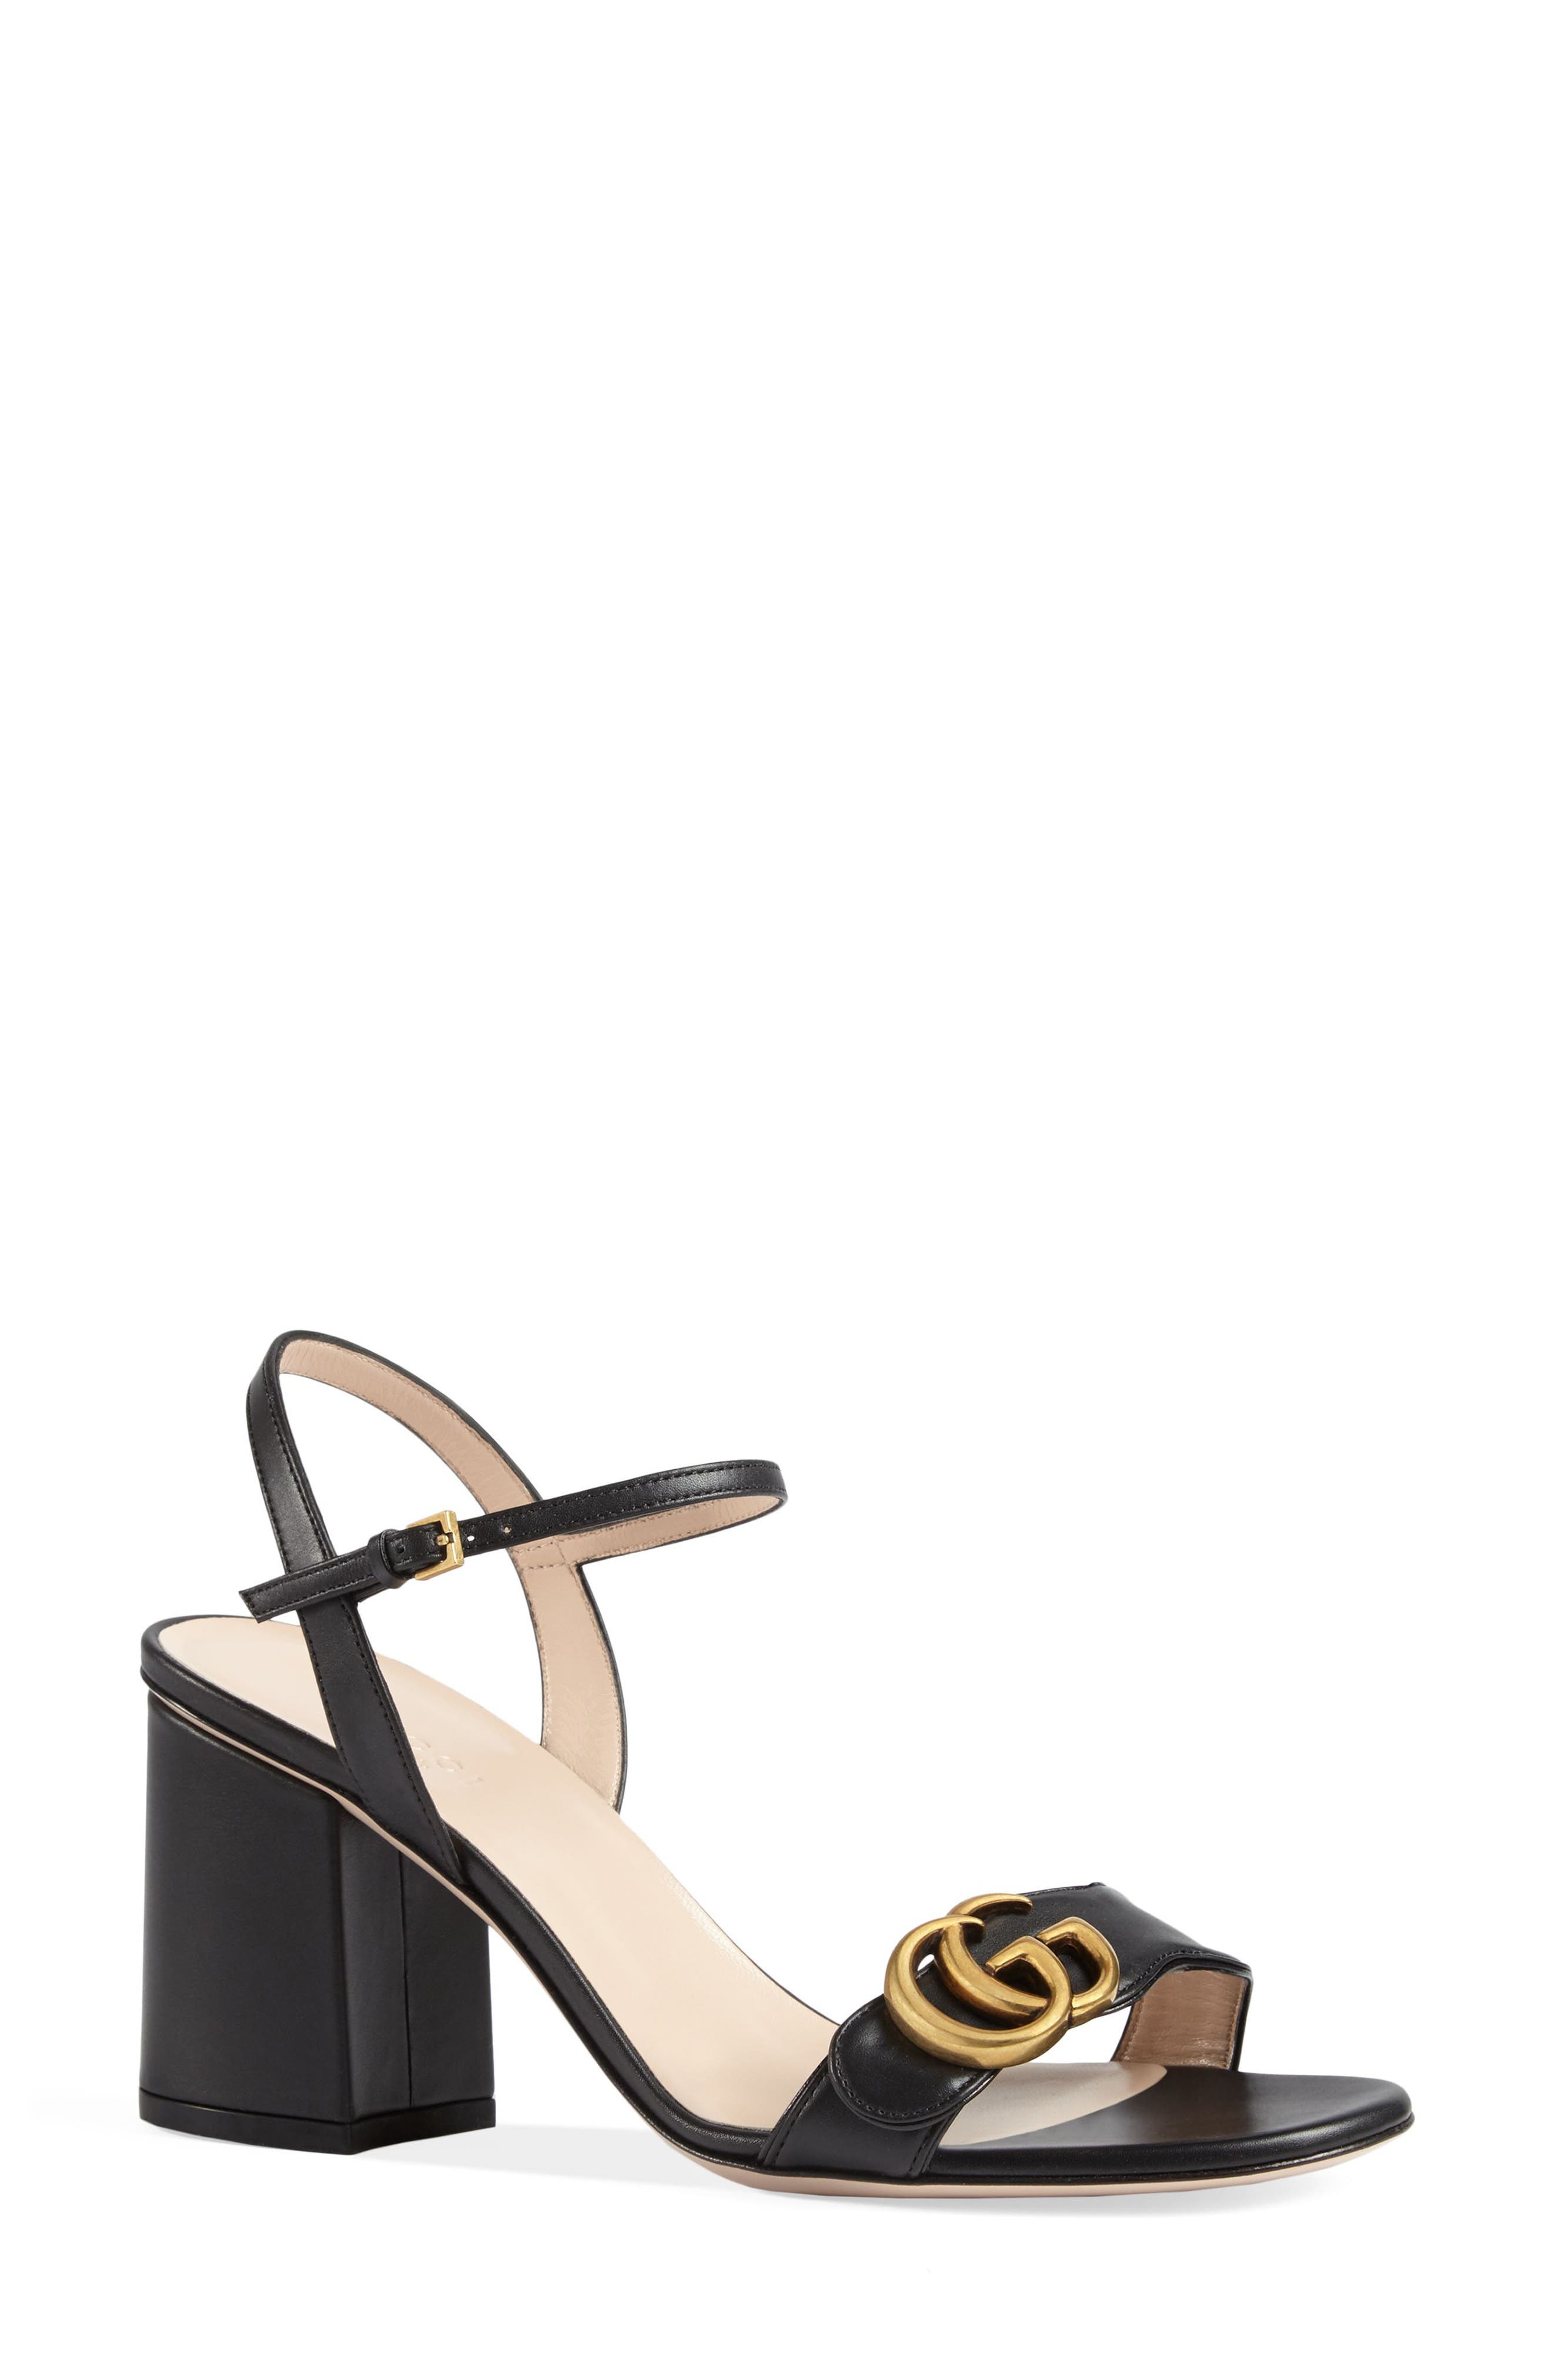 GUCCI GG Marmont Sandal, Main, color, BLACK LEATHER